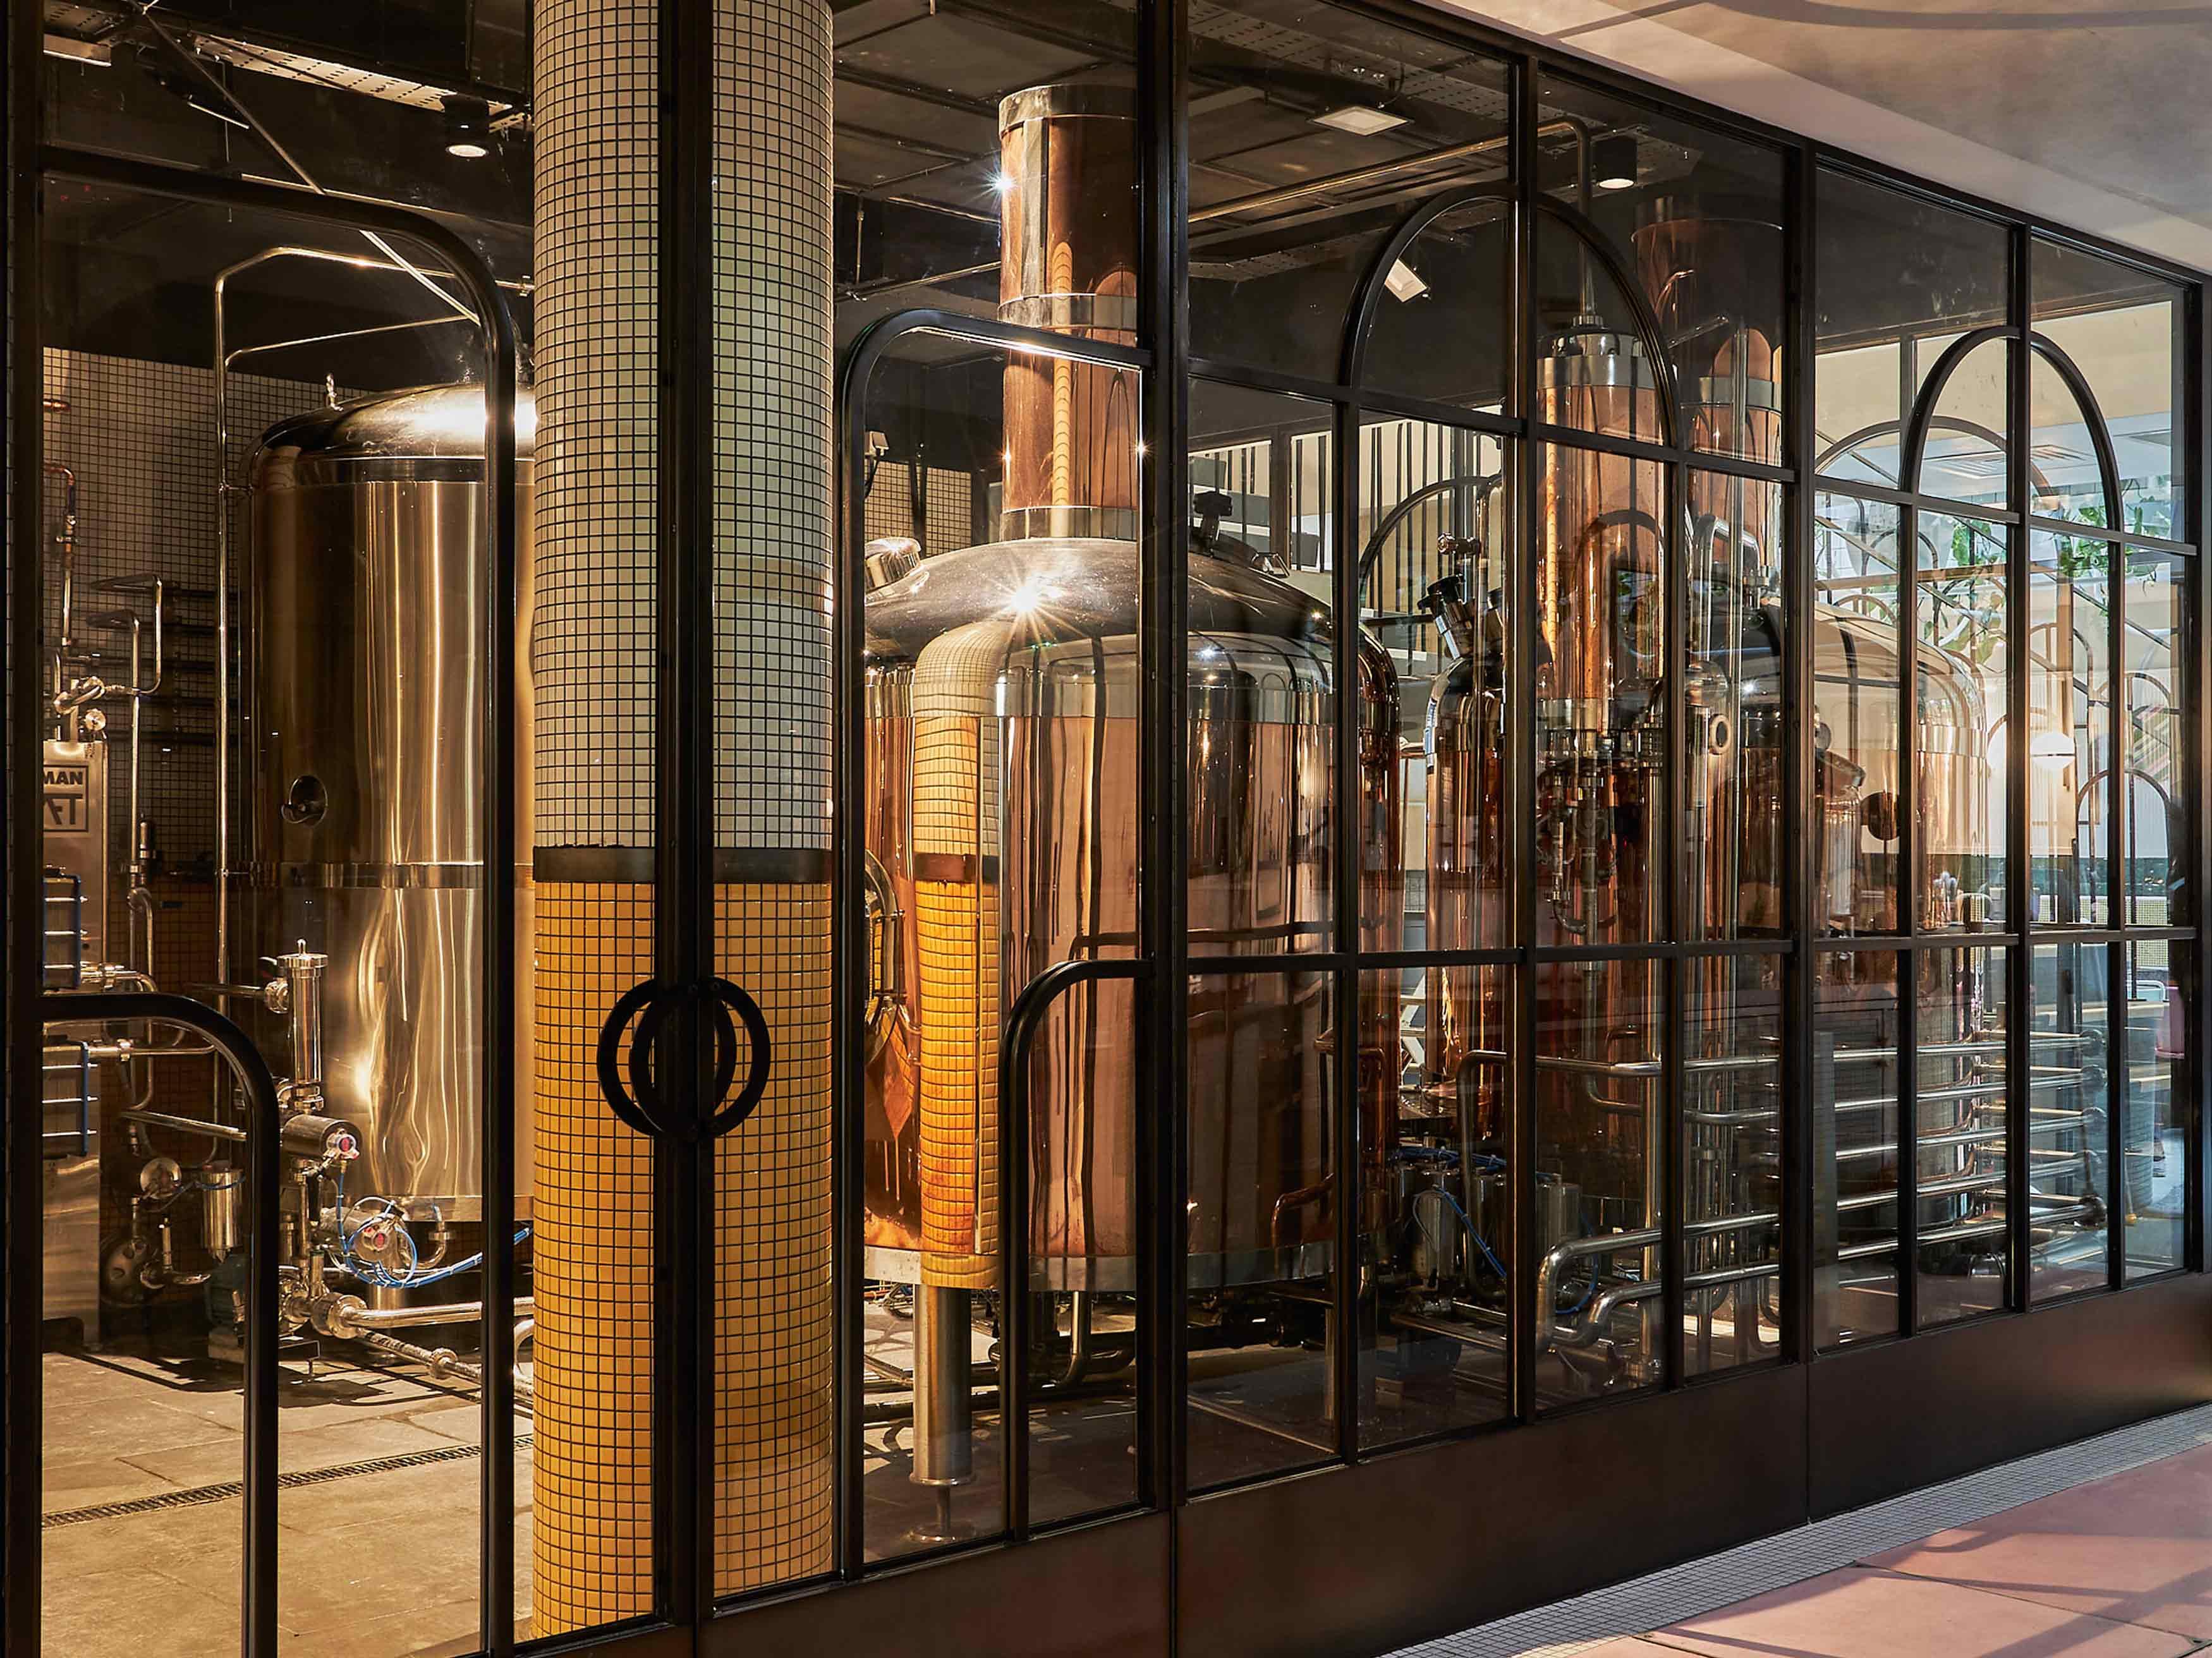 german kraft dalston brewery, east london